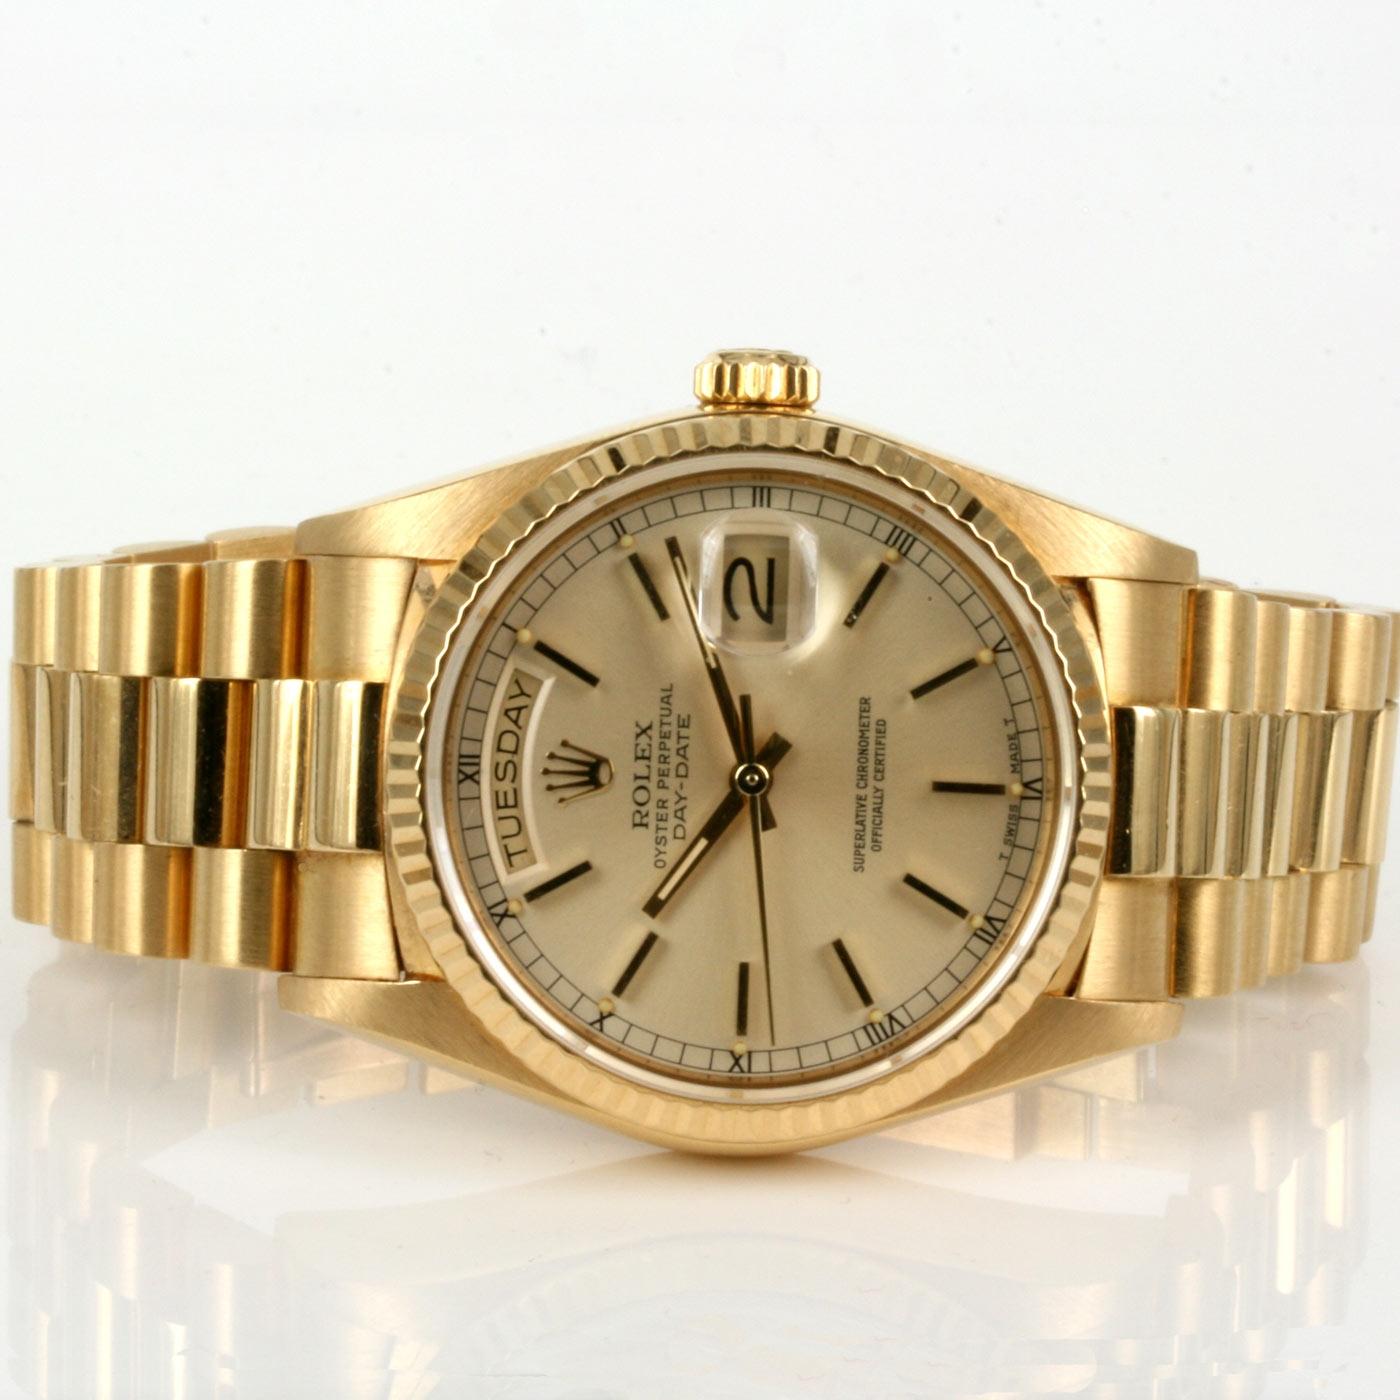 Мужские часы Day Date Presidential от Rolex